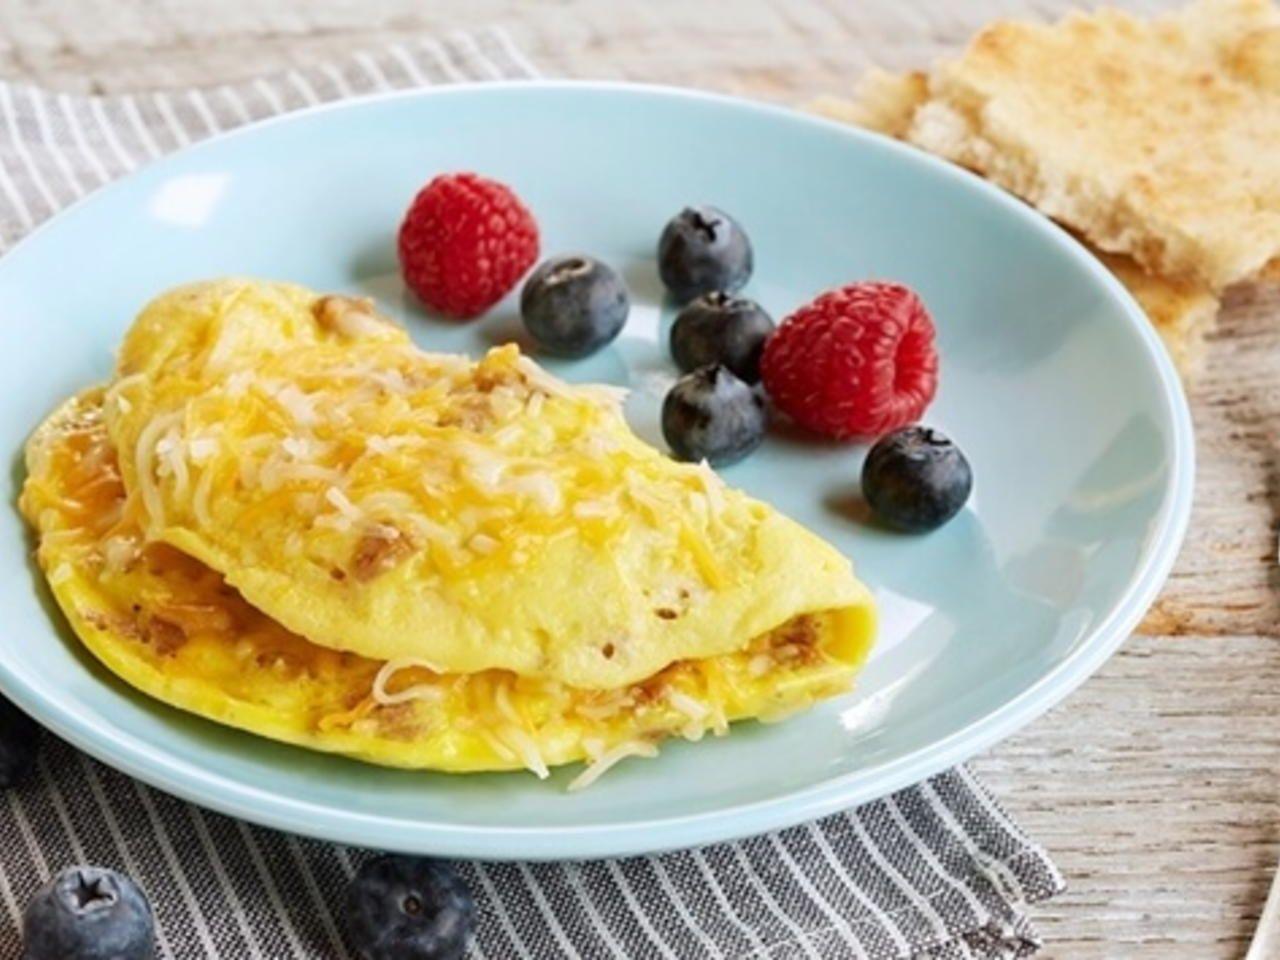 Resep Telur Omelette Resep Makanan Dadar Telur Makanan